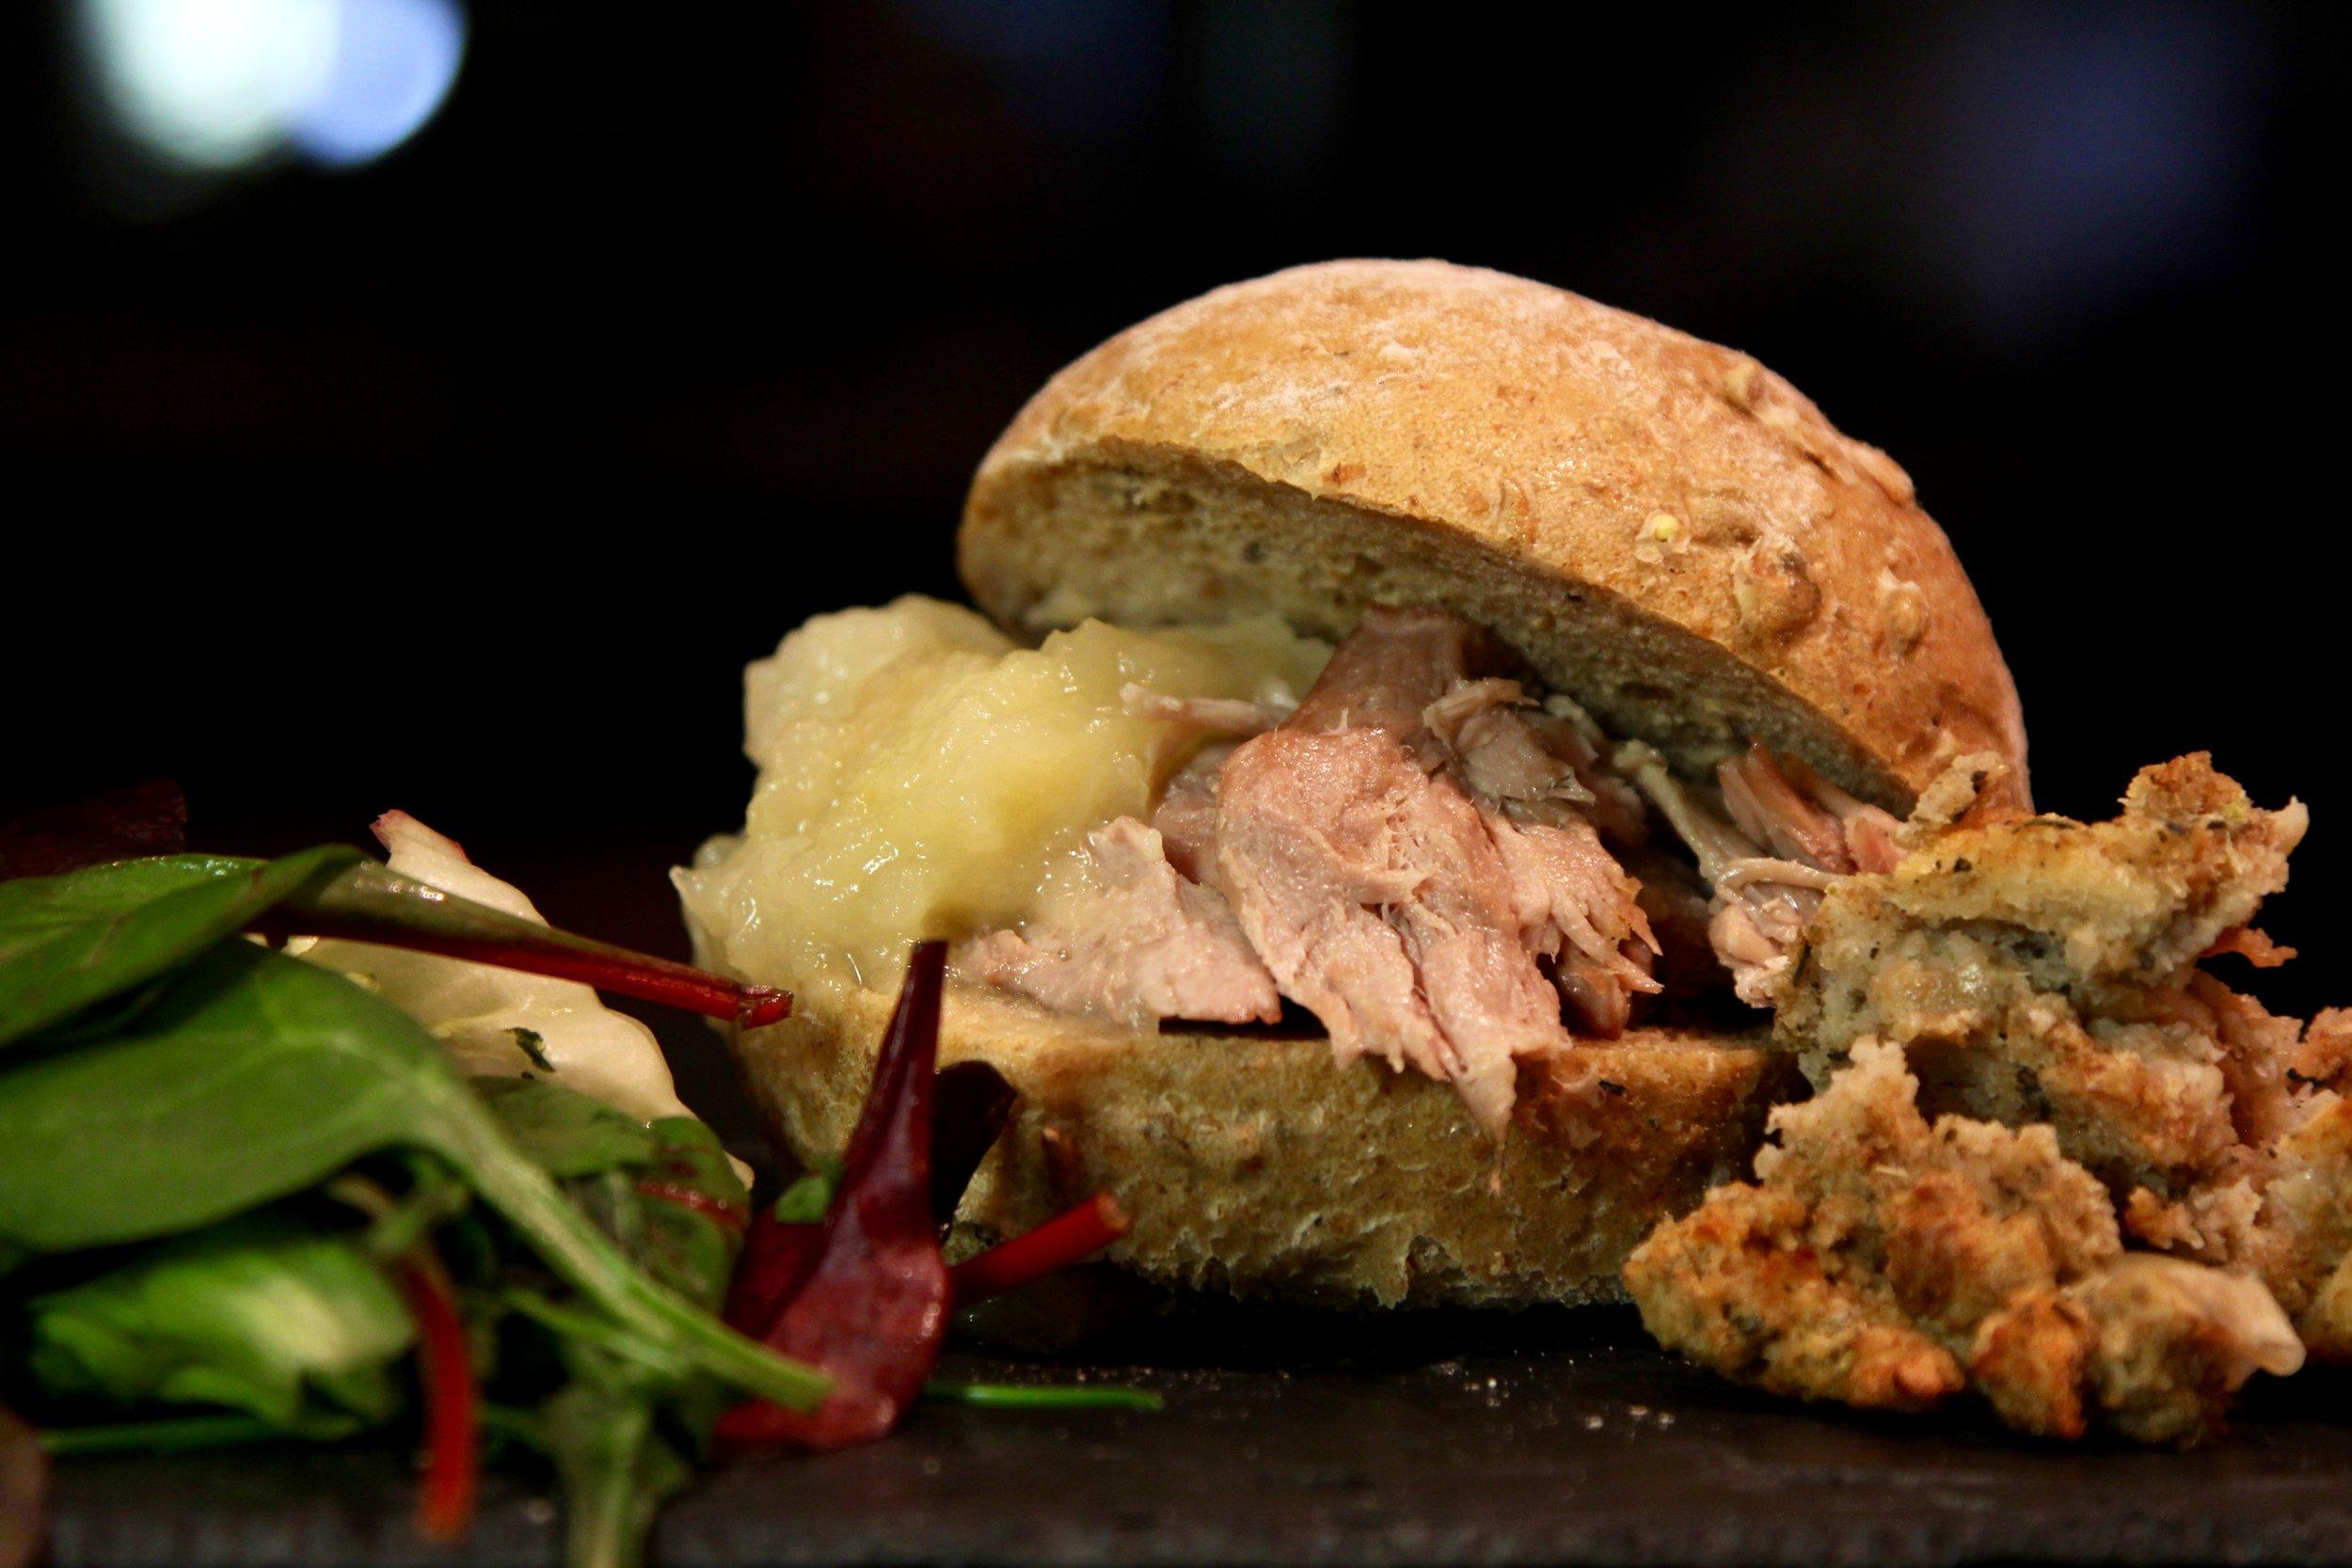 Amazing hog roast sandwich